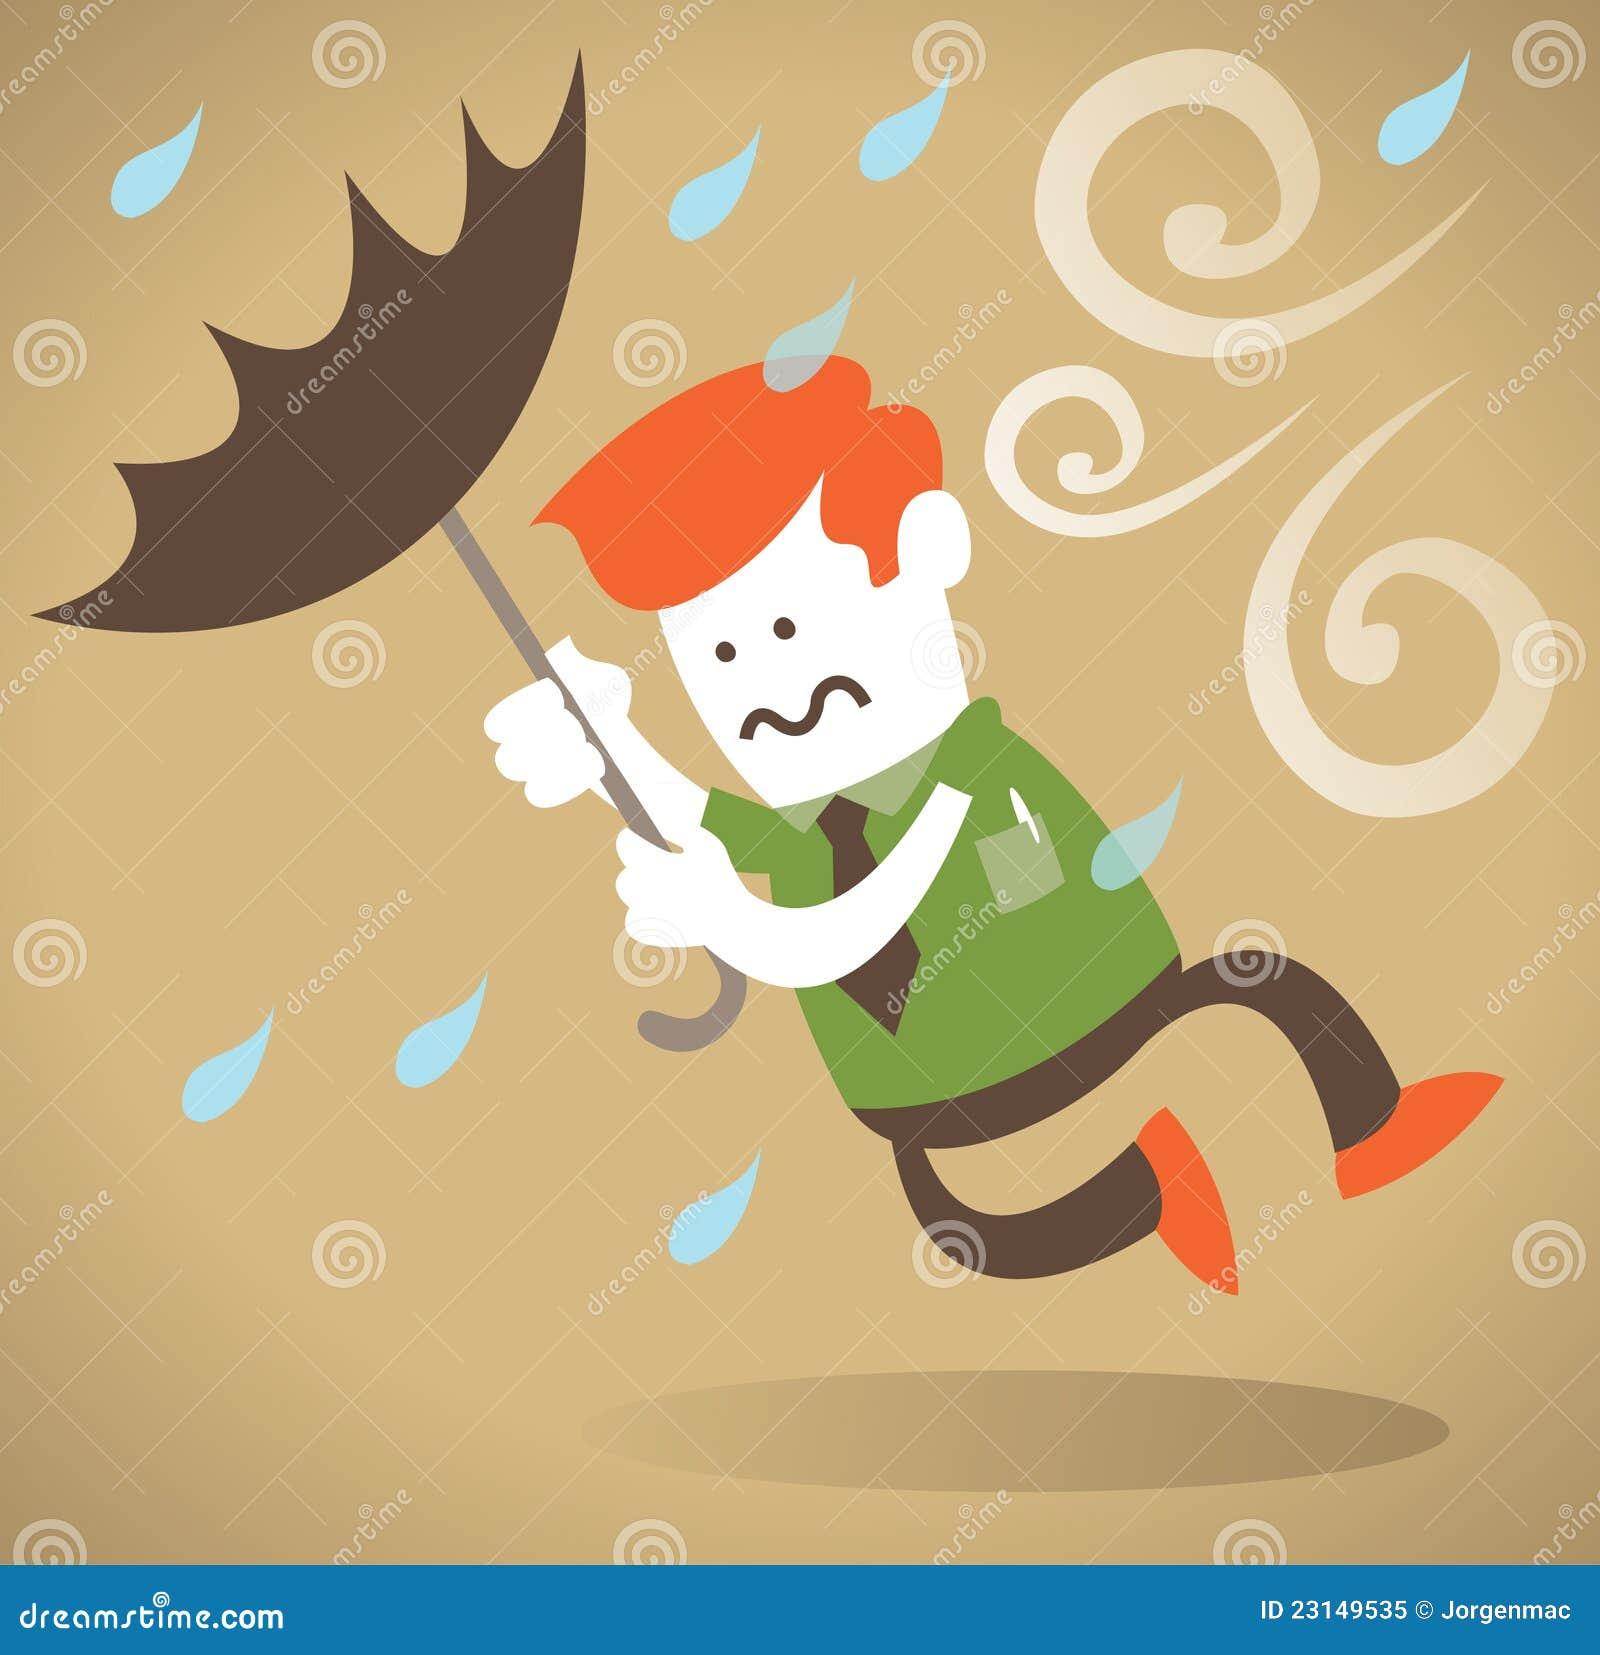 Retro Beach Illustration Royalty Free Stock Photo: Retro Corporate Guy Blown Away With Umbrella. Stock Vector